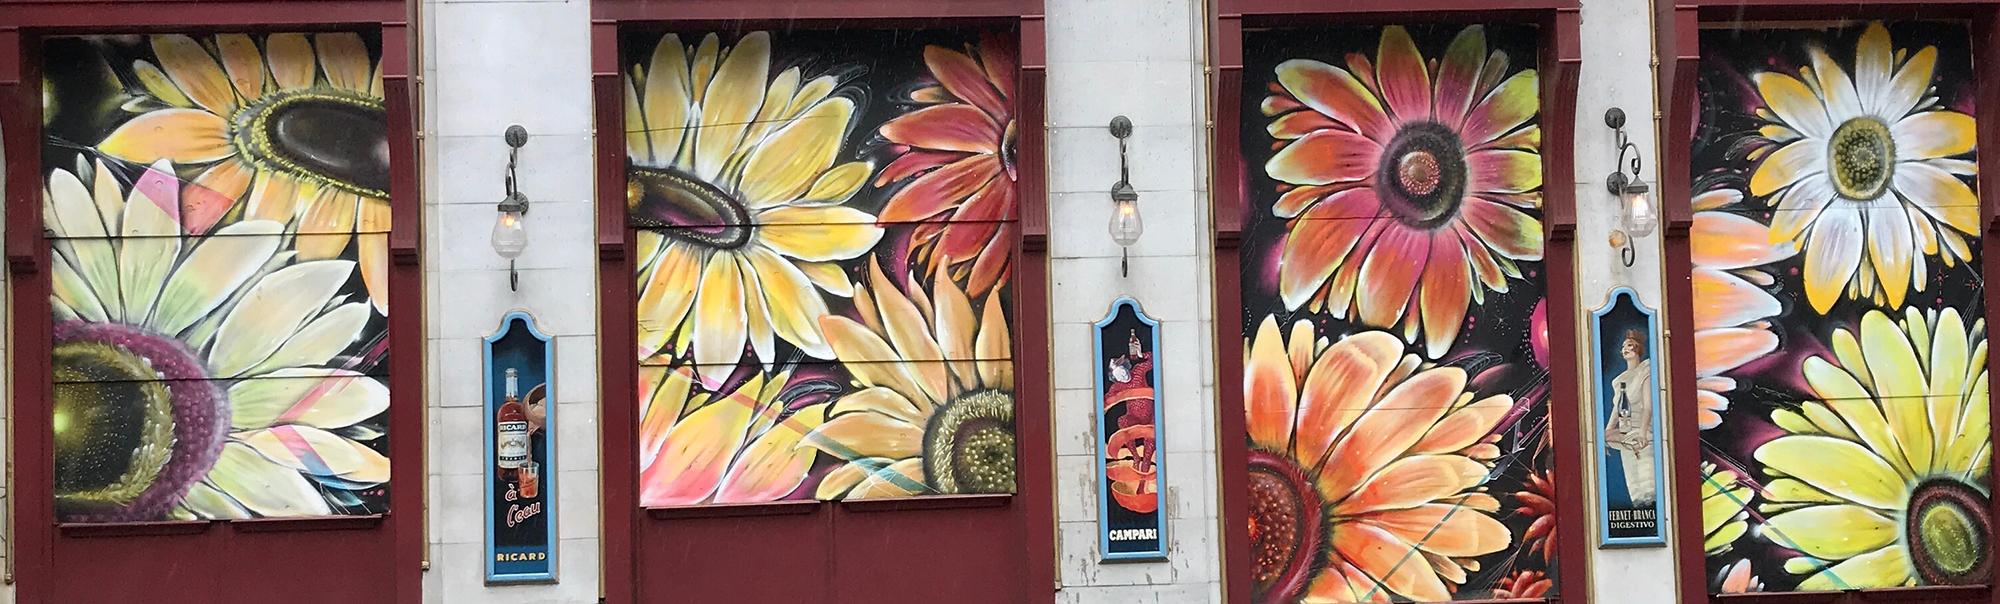 Flowers of Hope